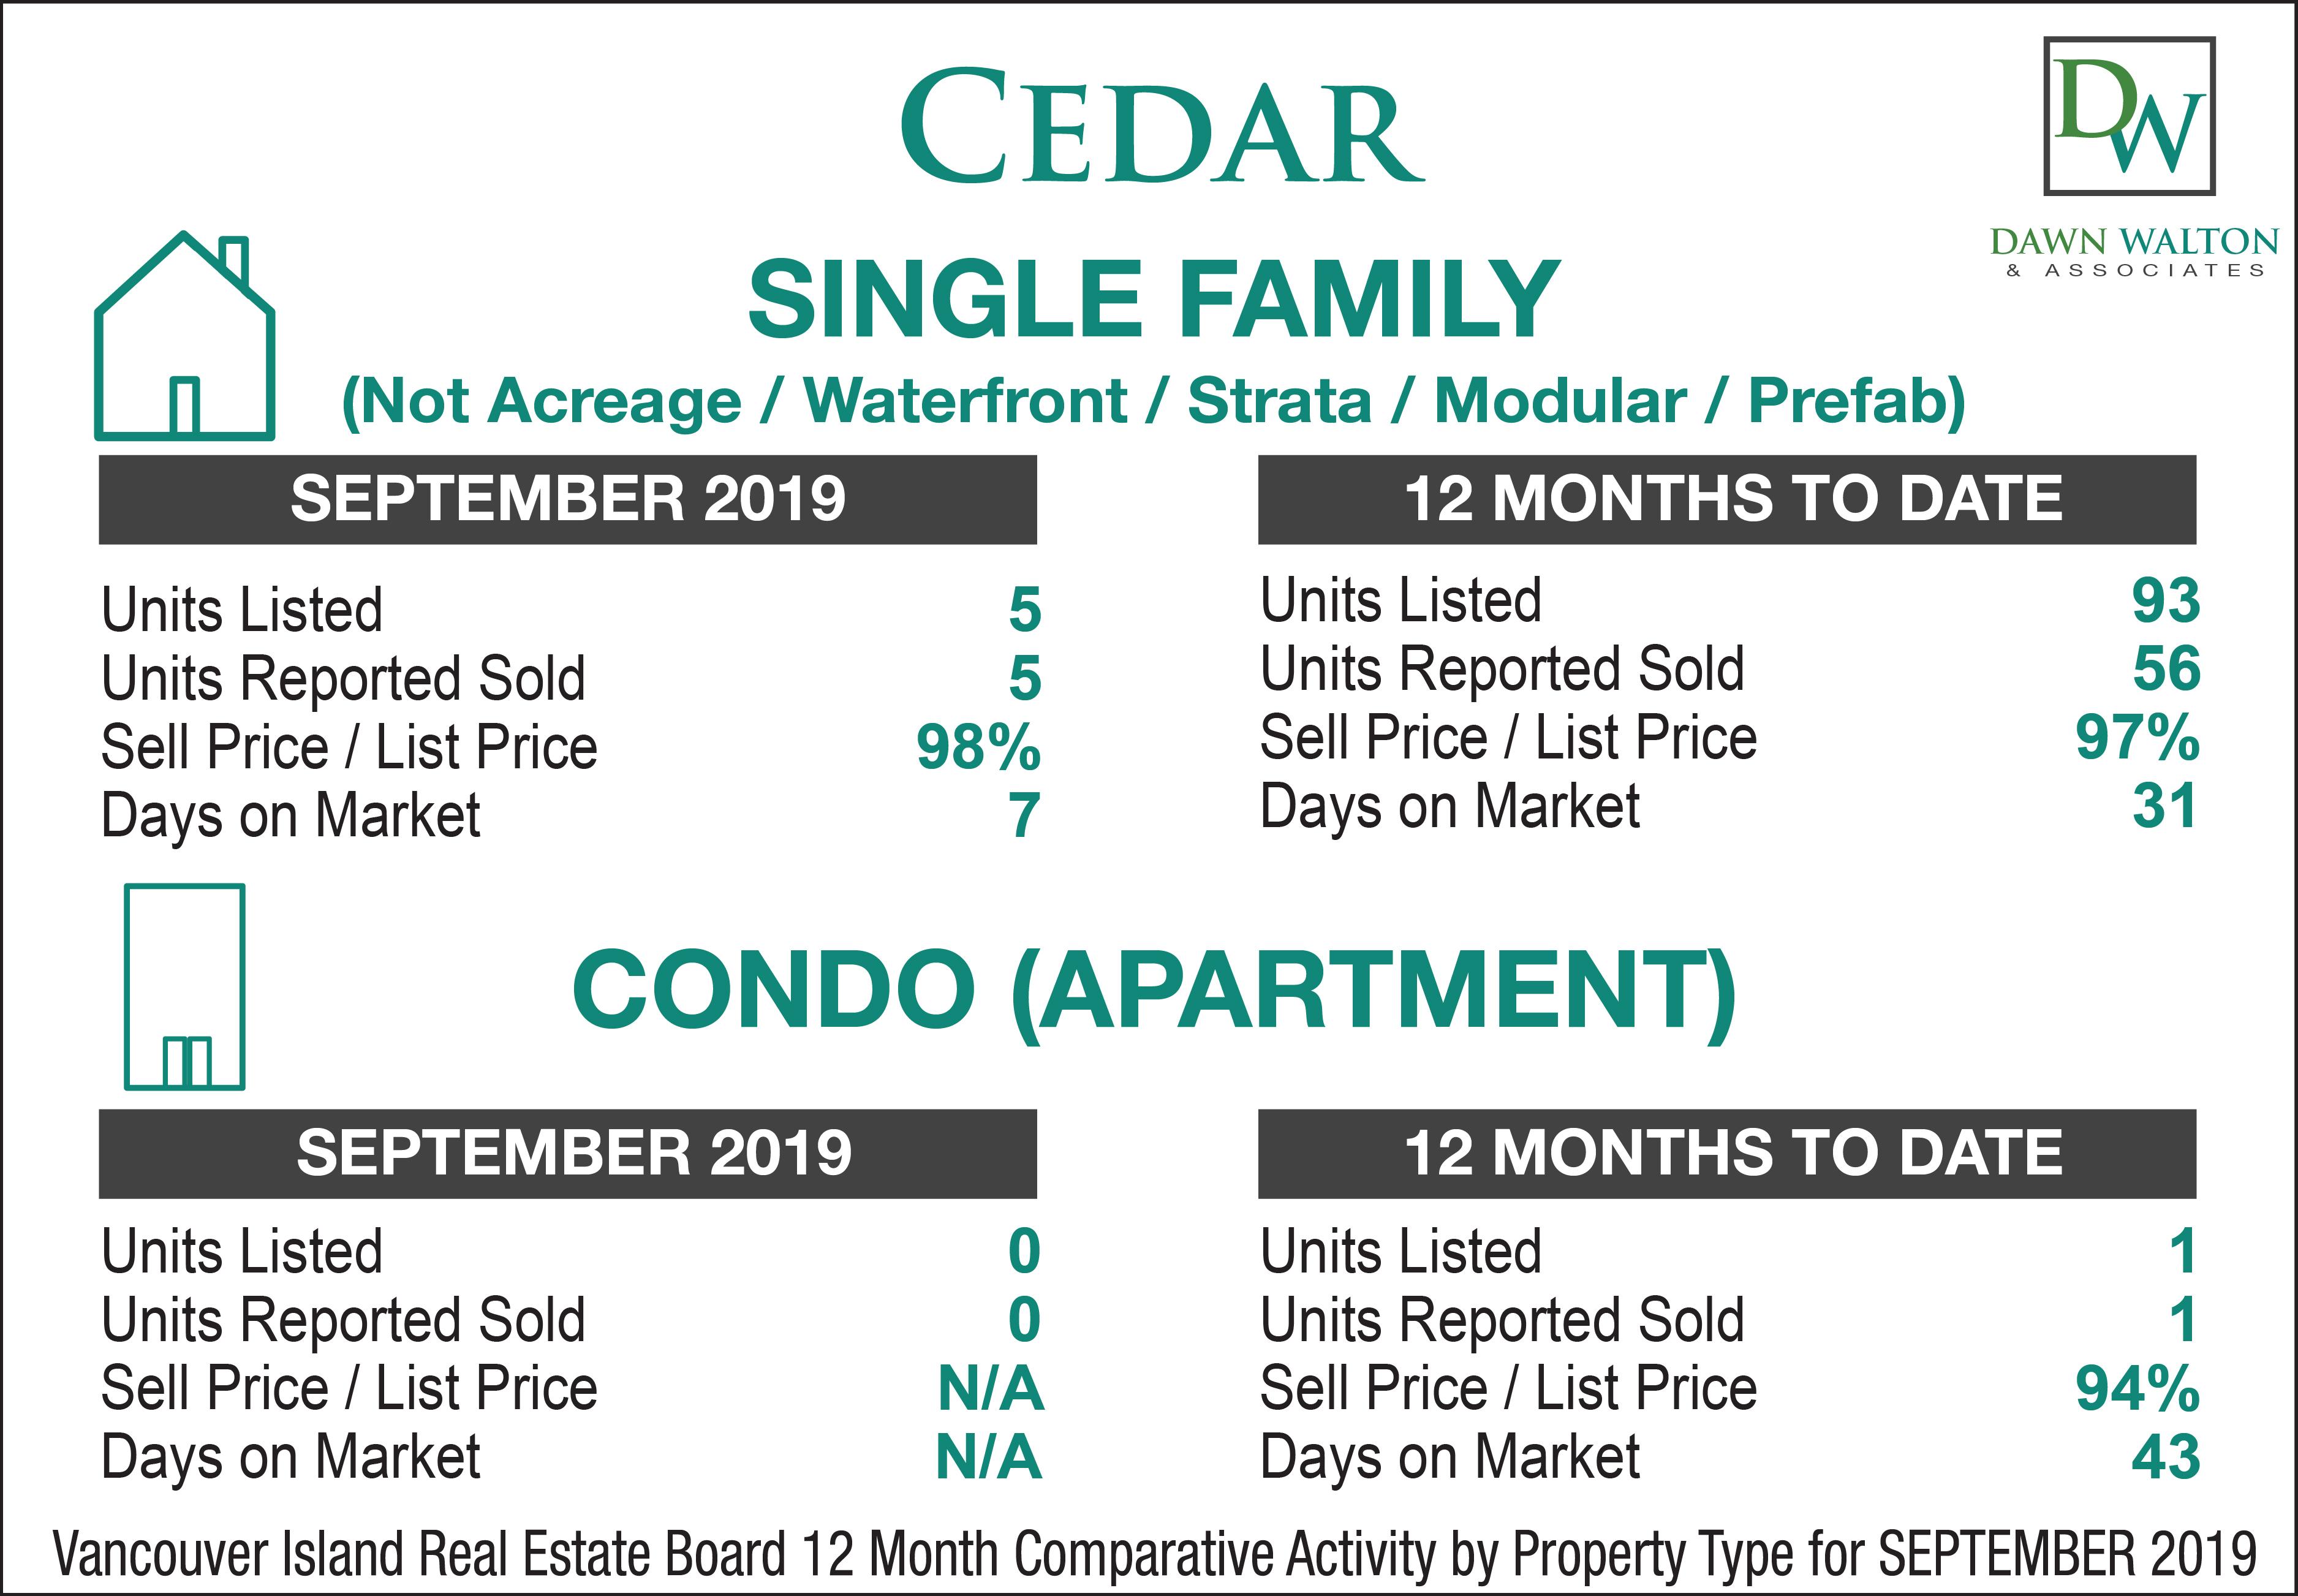 Cedar Real Estate Market Stats Price Percentage Jan 1-Sept 30 2019 - Nanaimo Realtor Dawn Walton